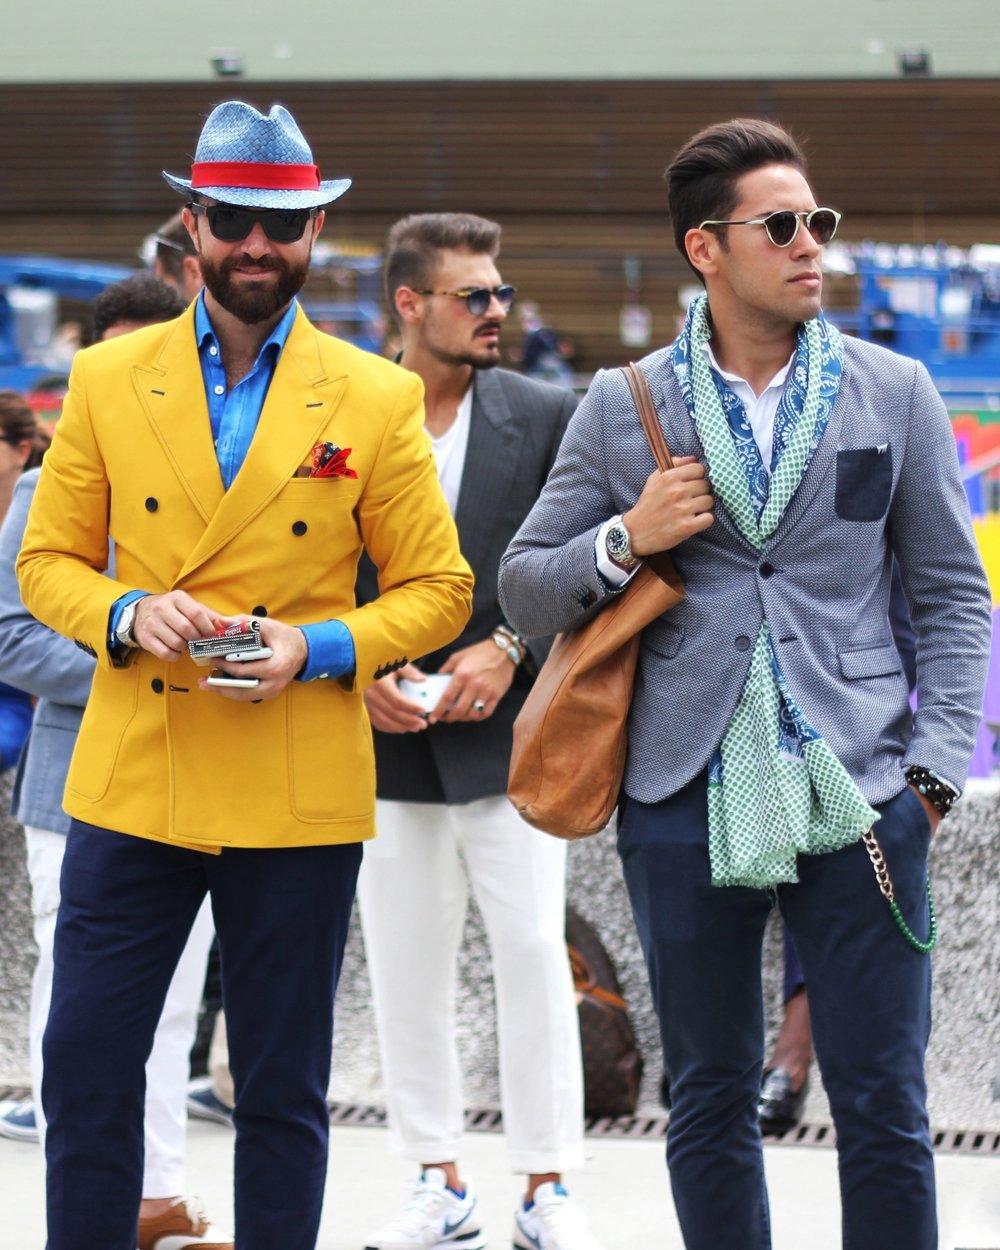 estilismo+men+2.jpg